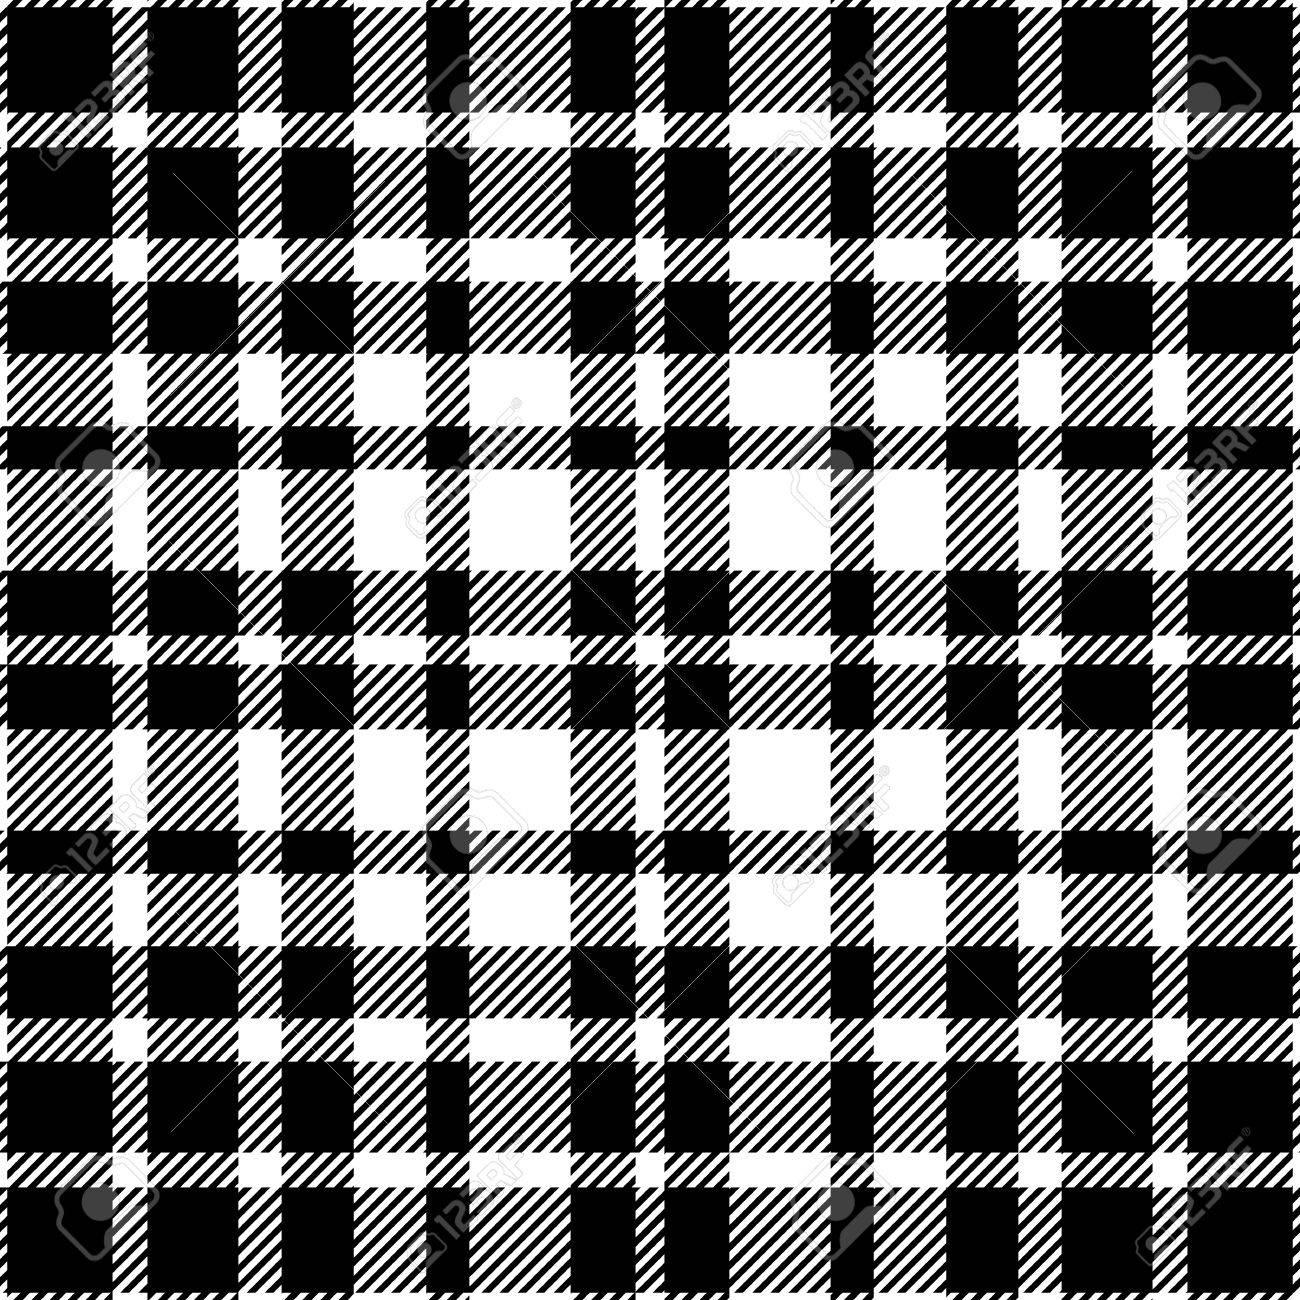 691702dae Modelo inconsútil de la tela escocesa de tartán en blanco y negro.